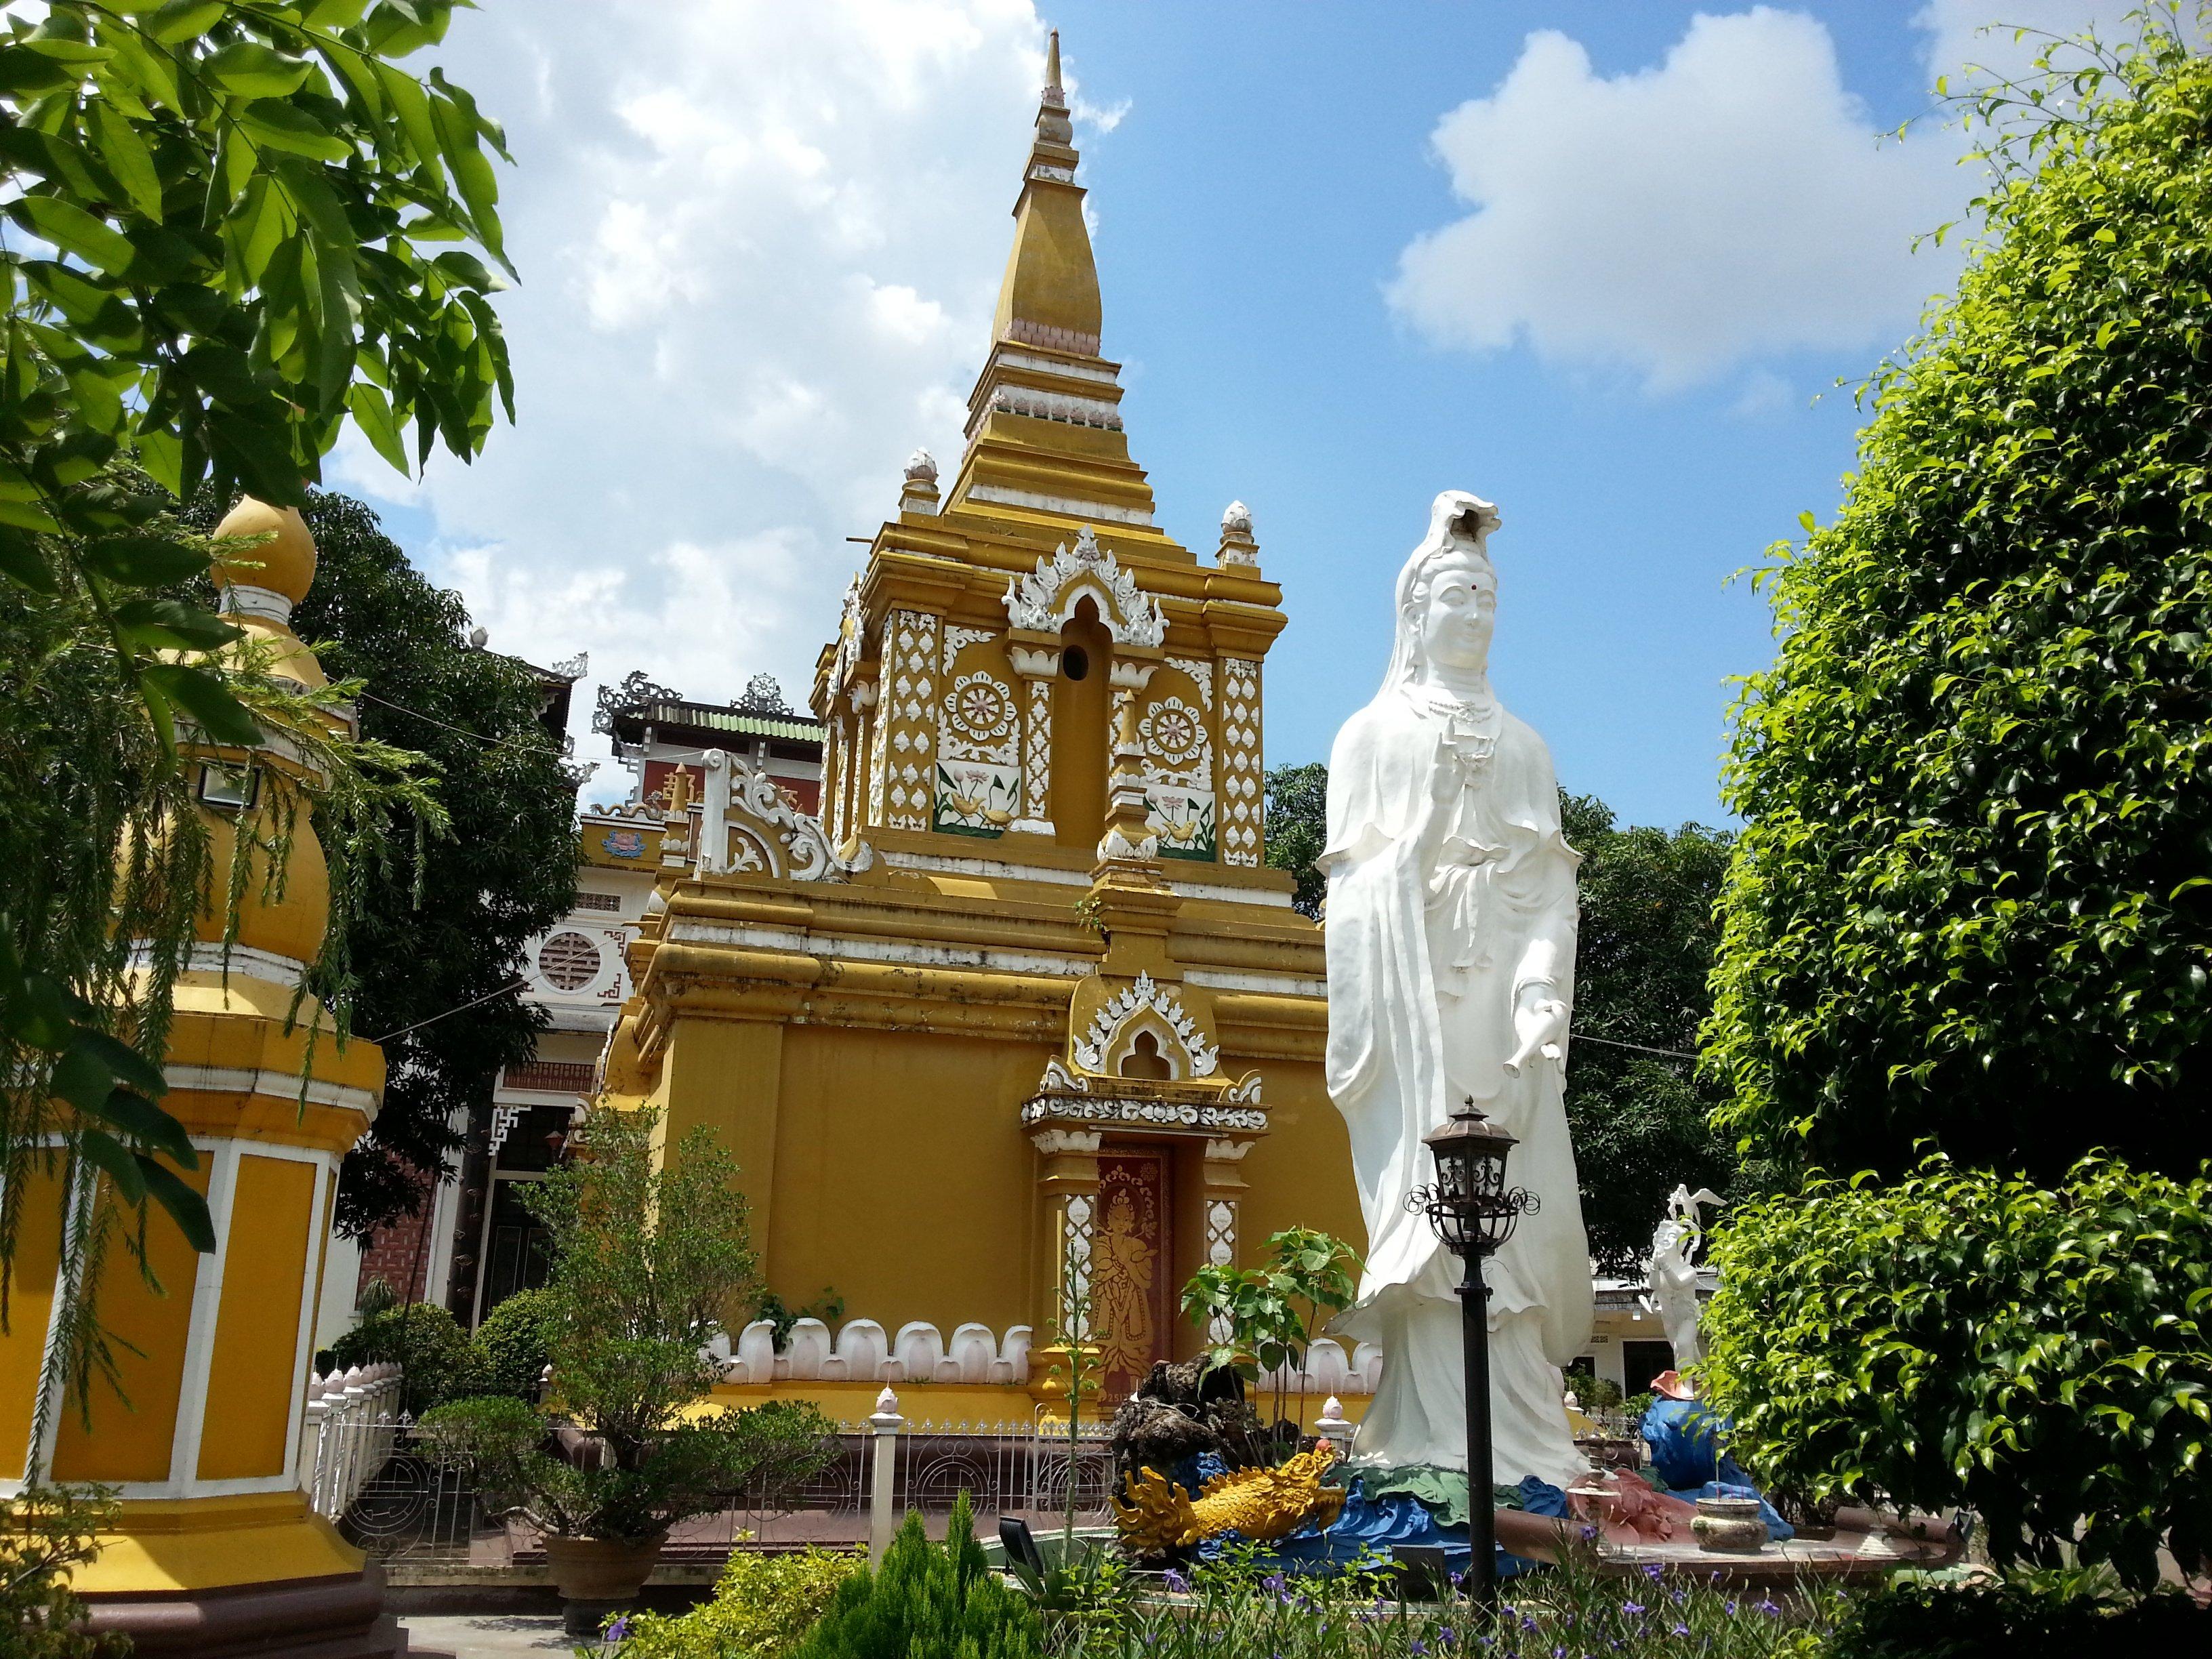 Quan Am statue at Chua Bang Long